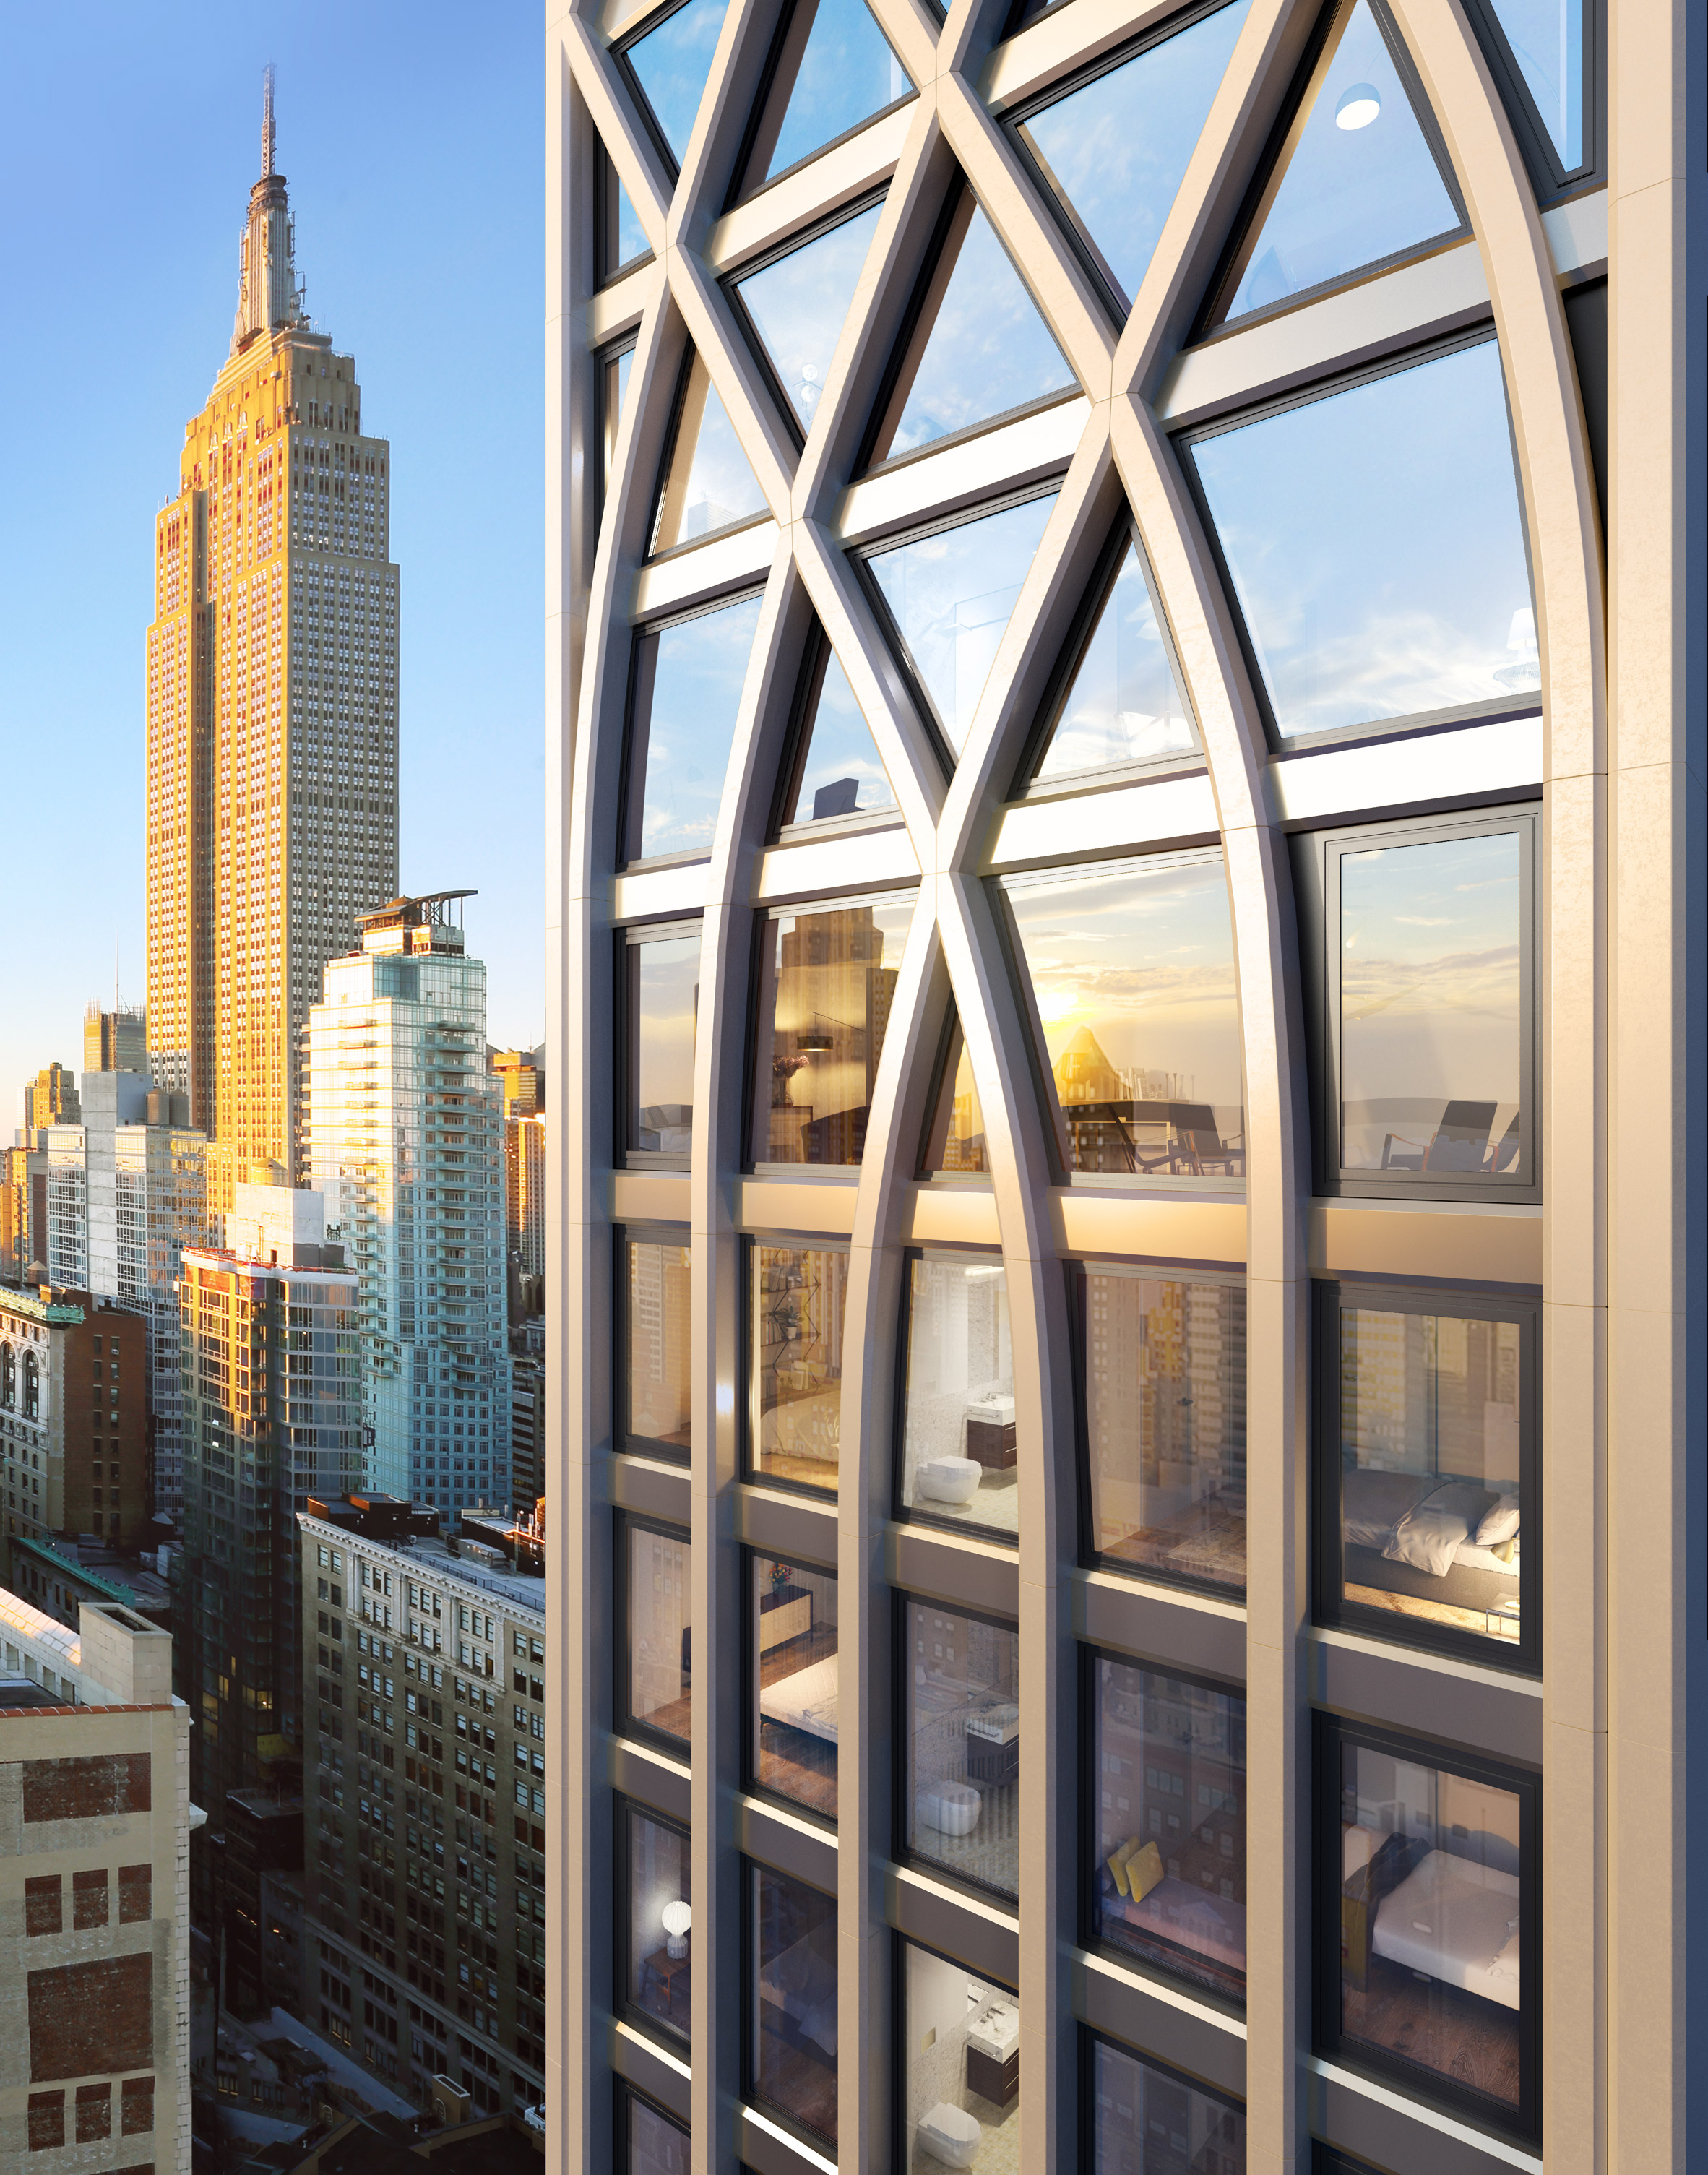 Morris Adjmi designs skyscraper with lancet windows for New York City